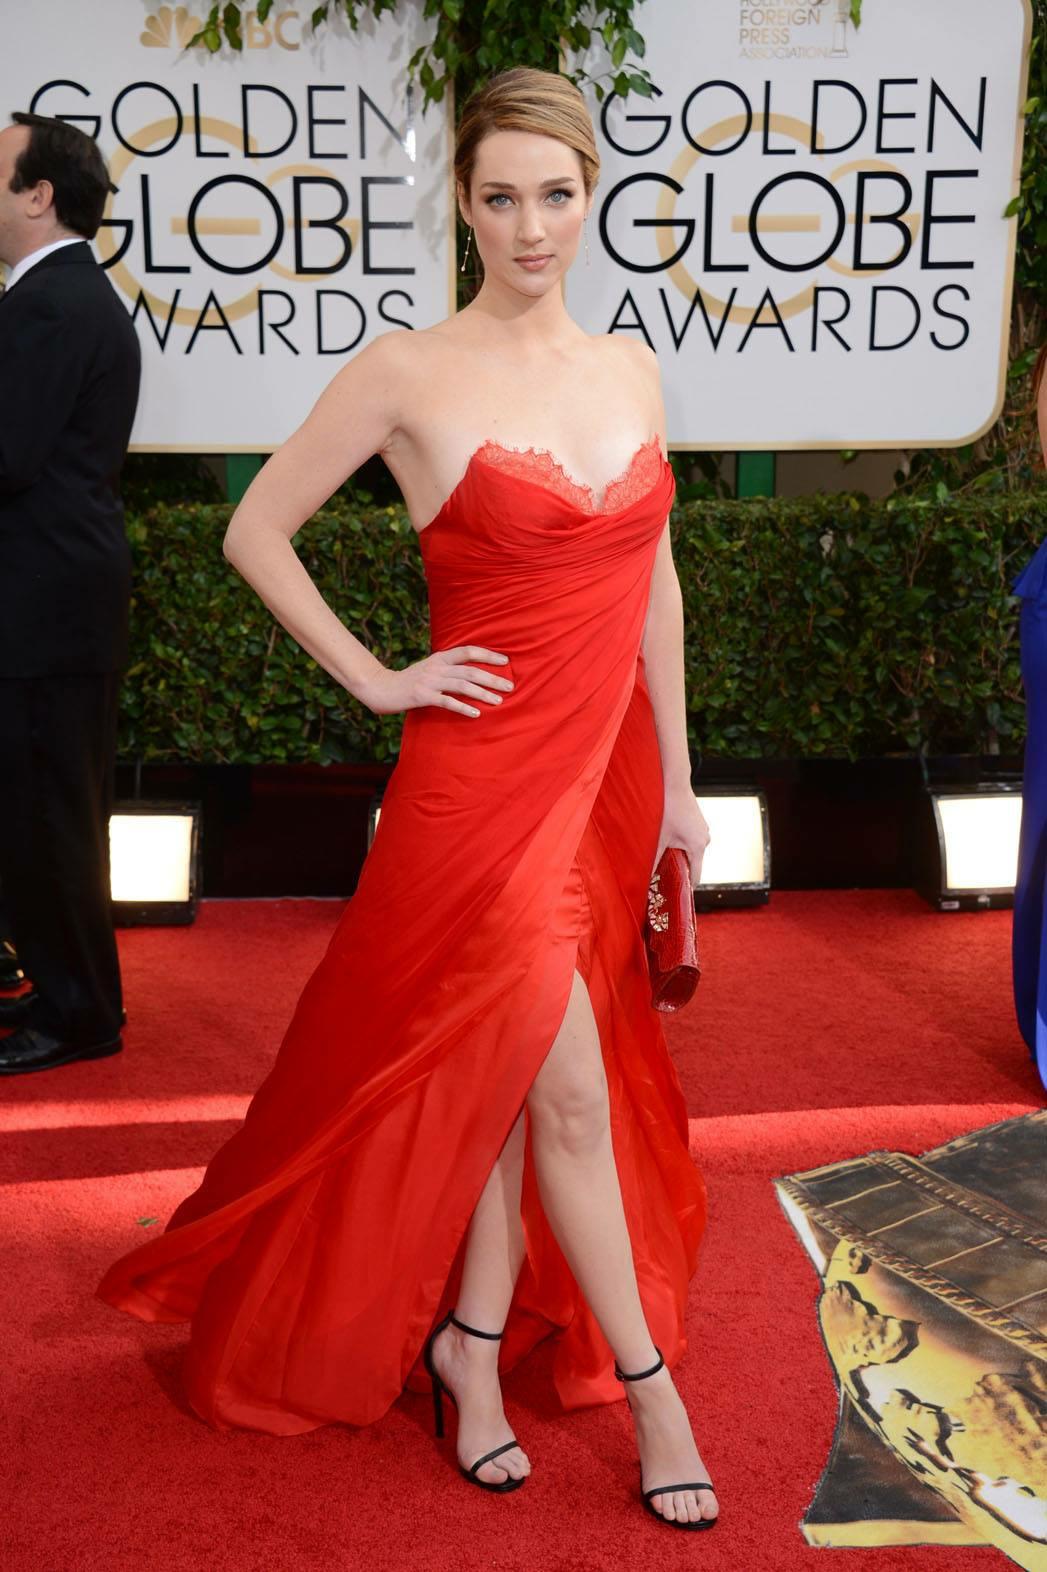 Kristen Connolly Profile Pics Dp Images - Whatsapp Images